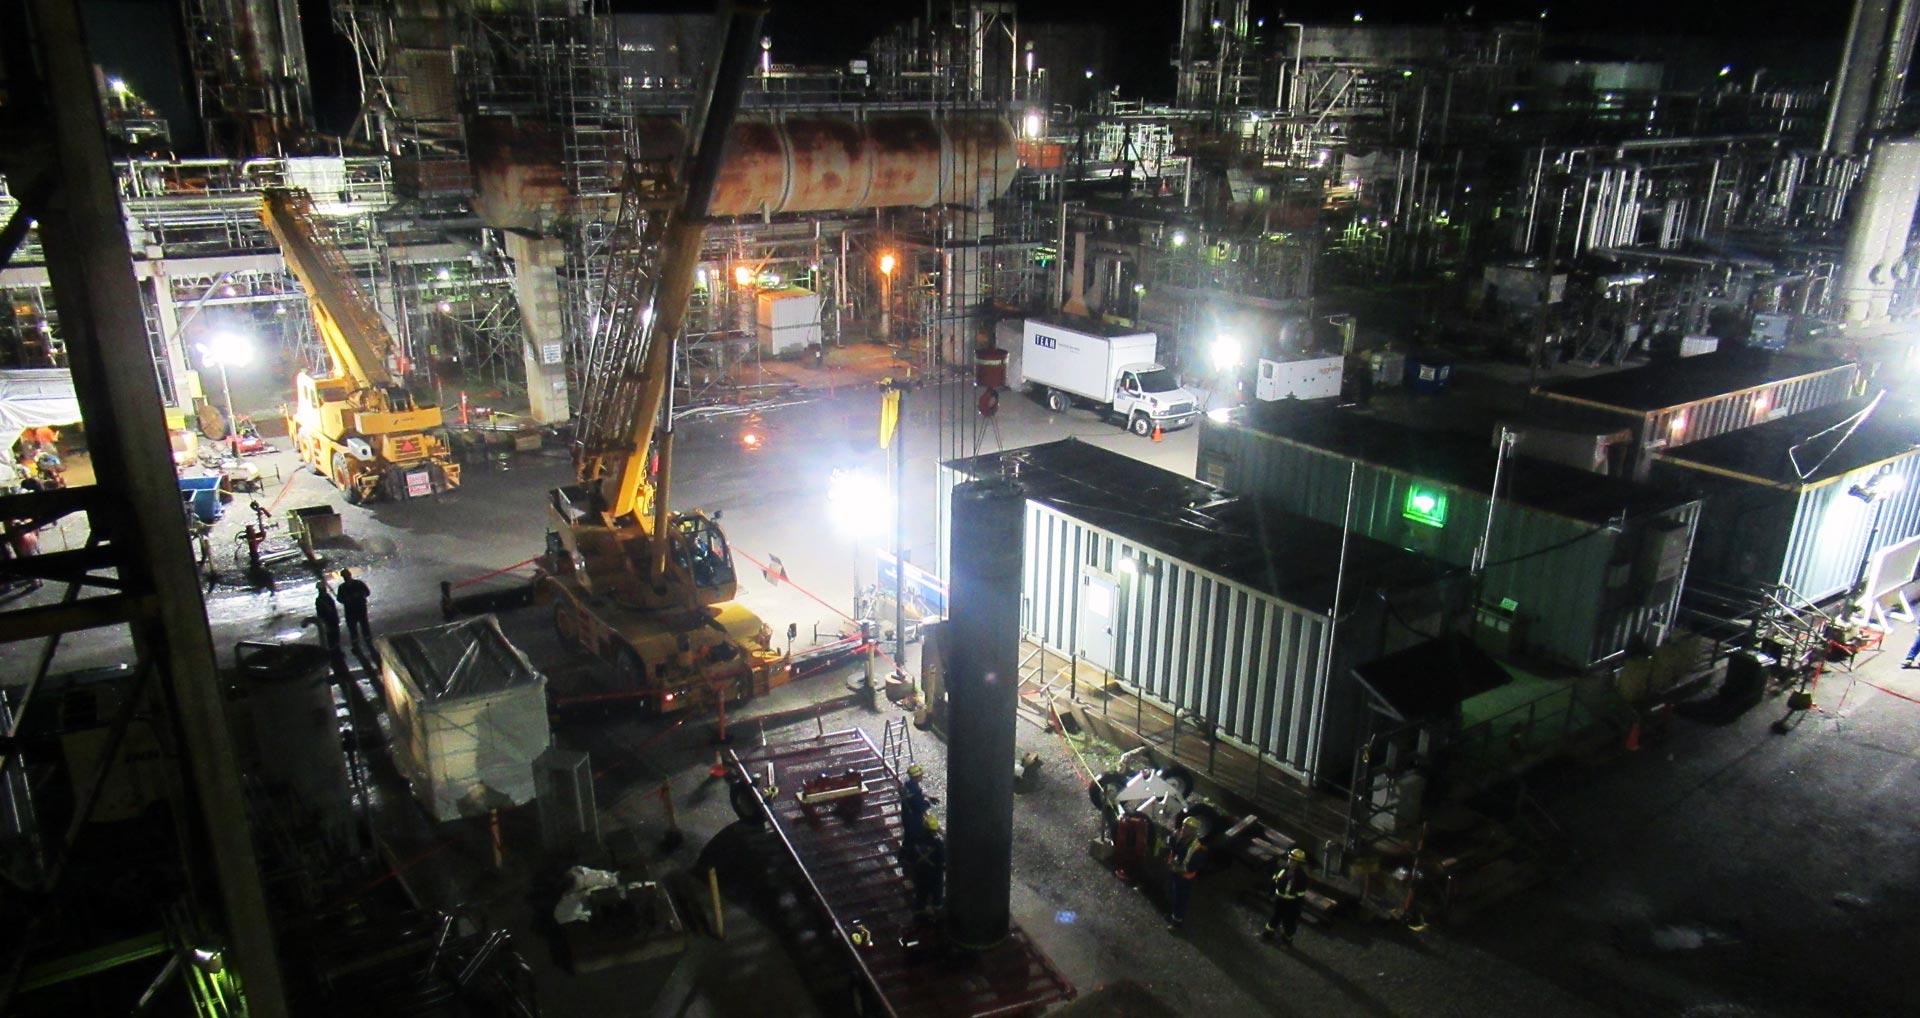 tiw-major-turnaround-project-platform-reactor-center-pipe-hoist-hero-1